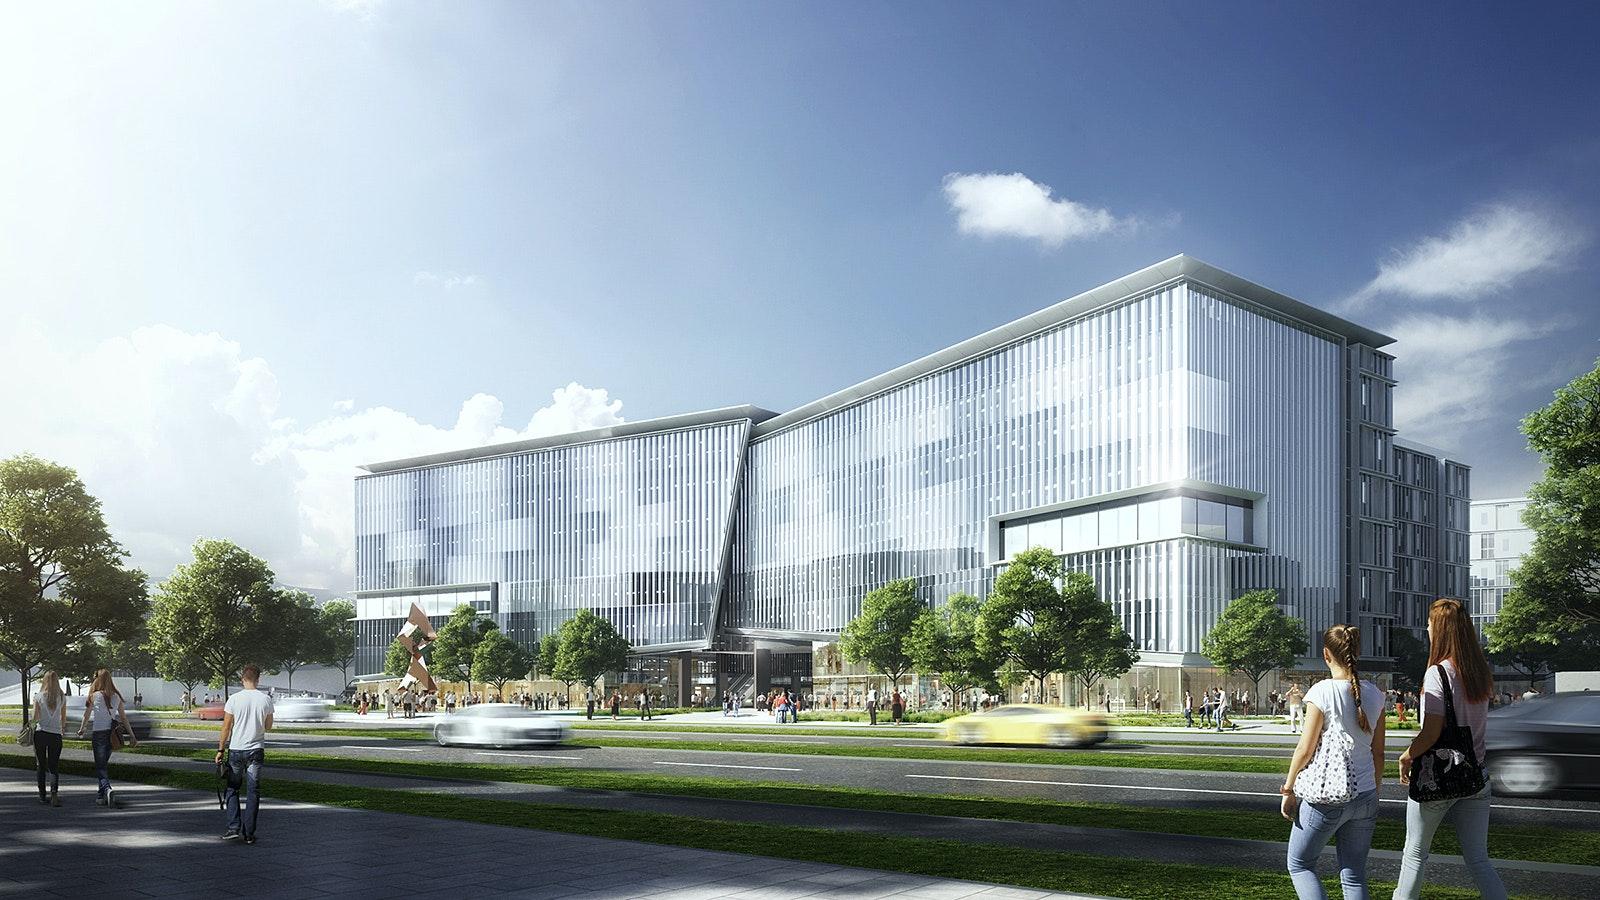 10 DESIGN To Develop 55,000m2 Jinwan Aviation Research + Development Center  In China